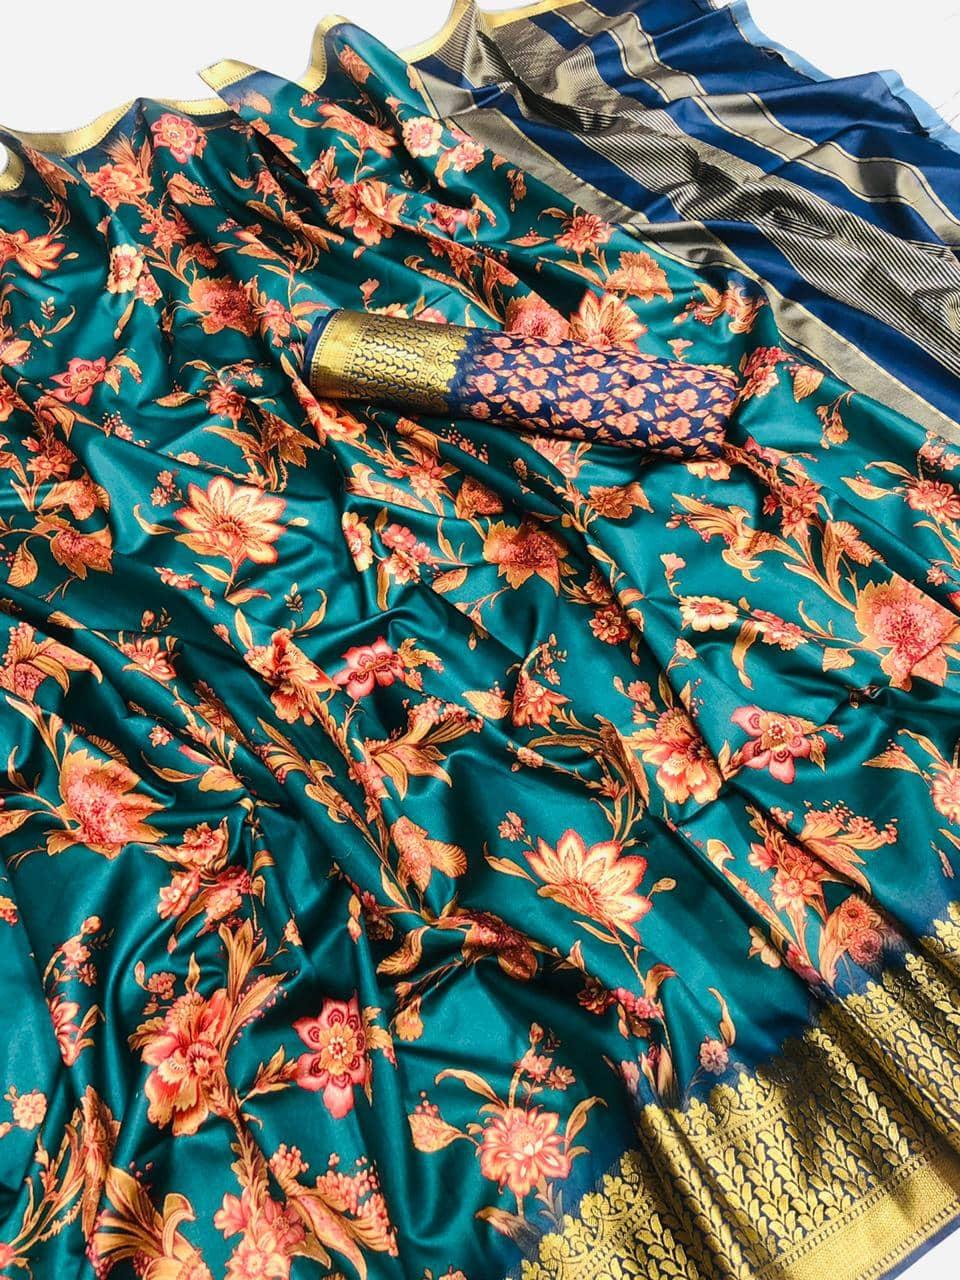 Soft cotton jacquard border with digital printed saree dvz0001536